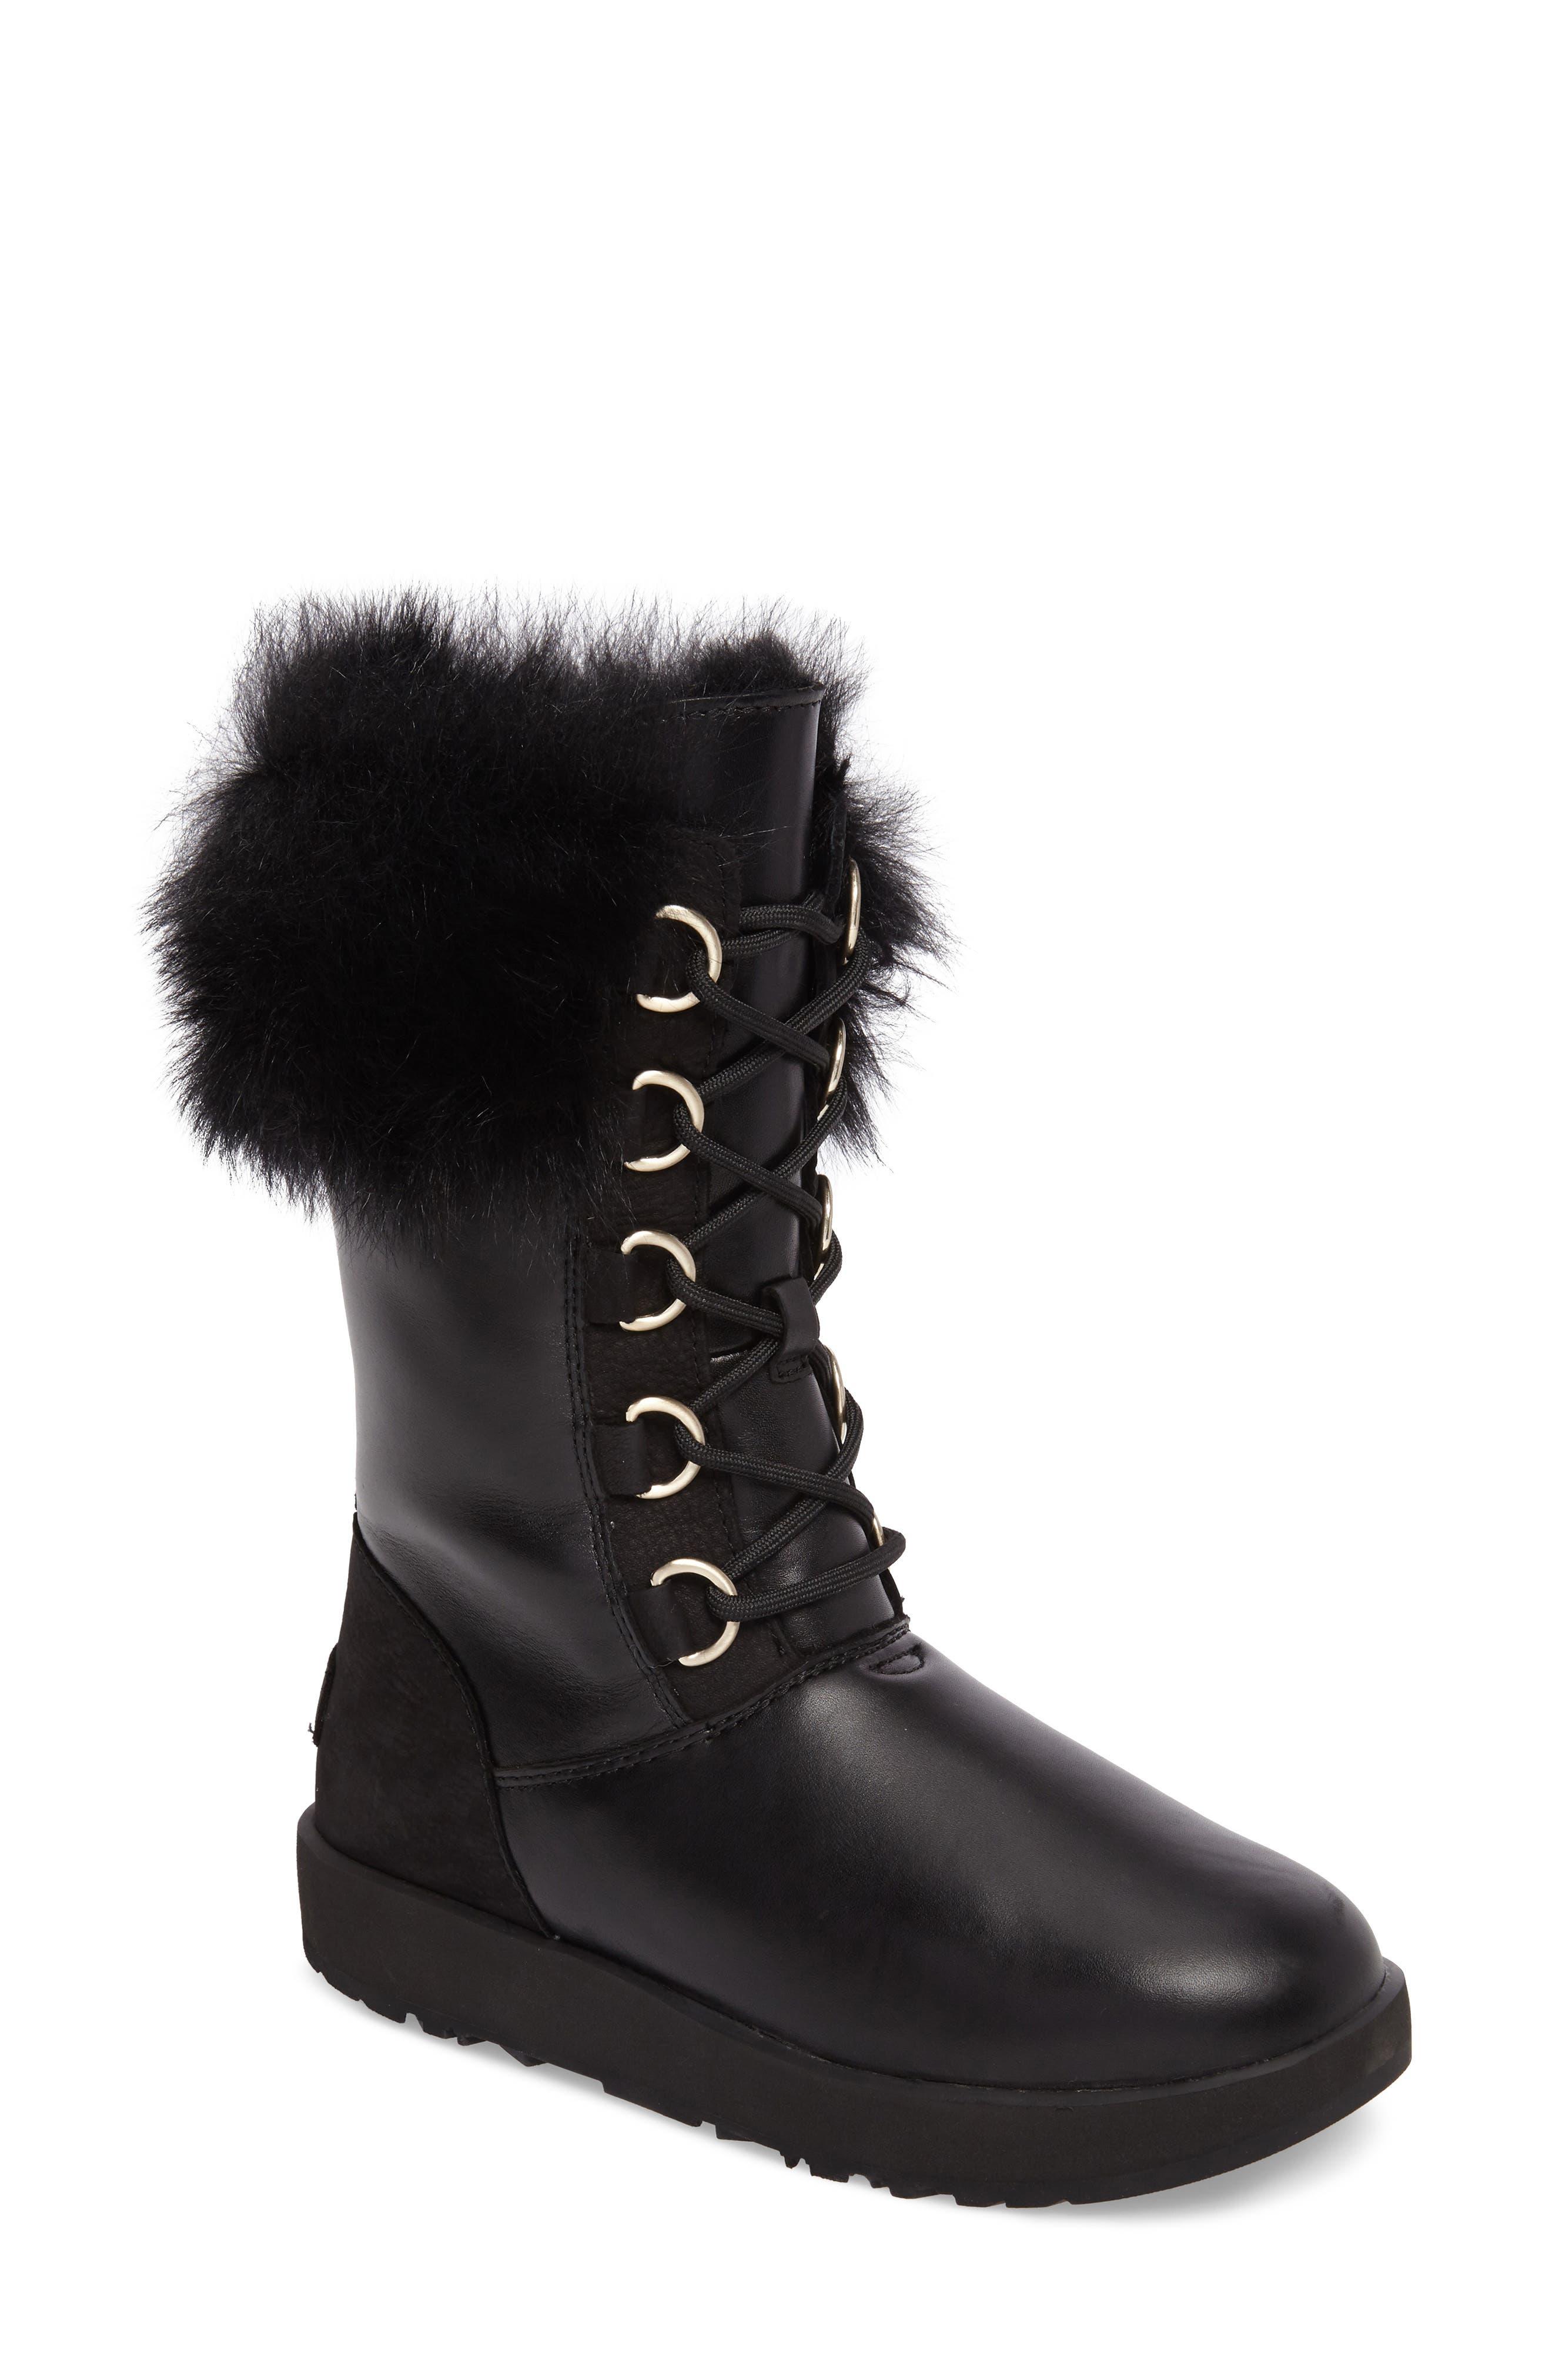 Alternate Image 1 Selected - UGG® Aya Waterproof Snow Boot (Women)